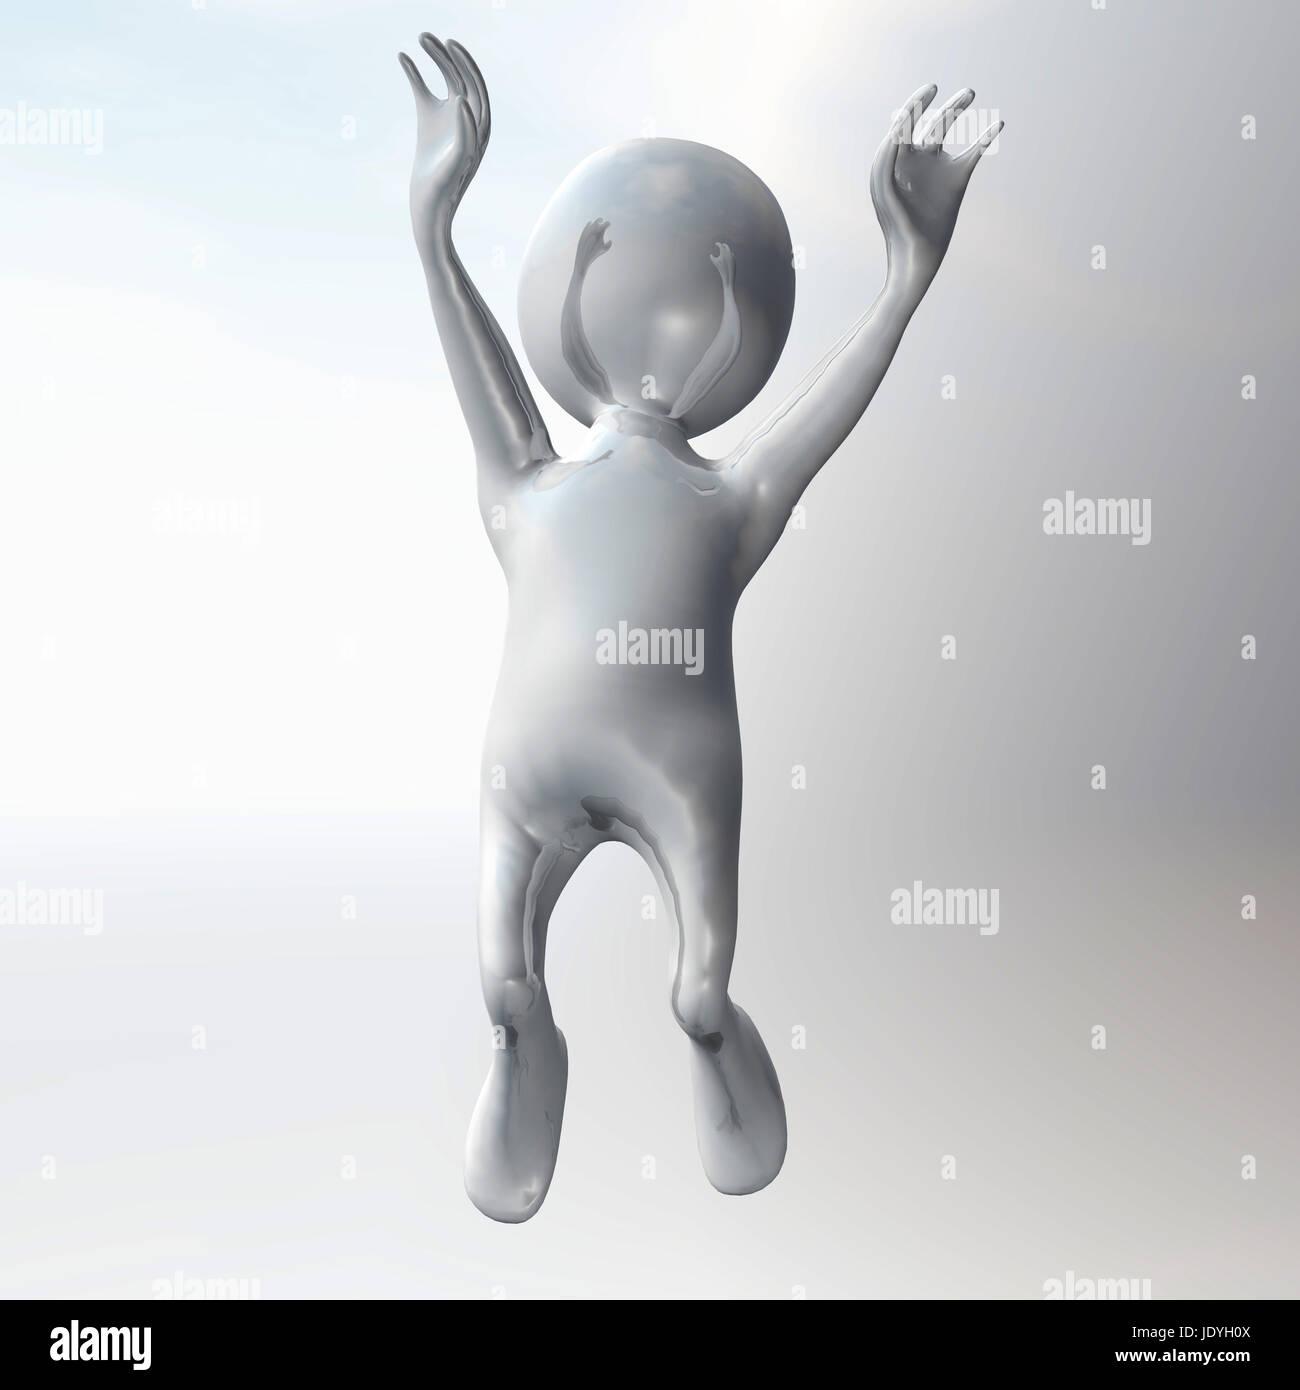 Digital Illustration of a Stickman Stock Photo